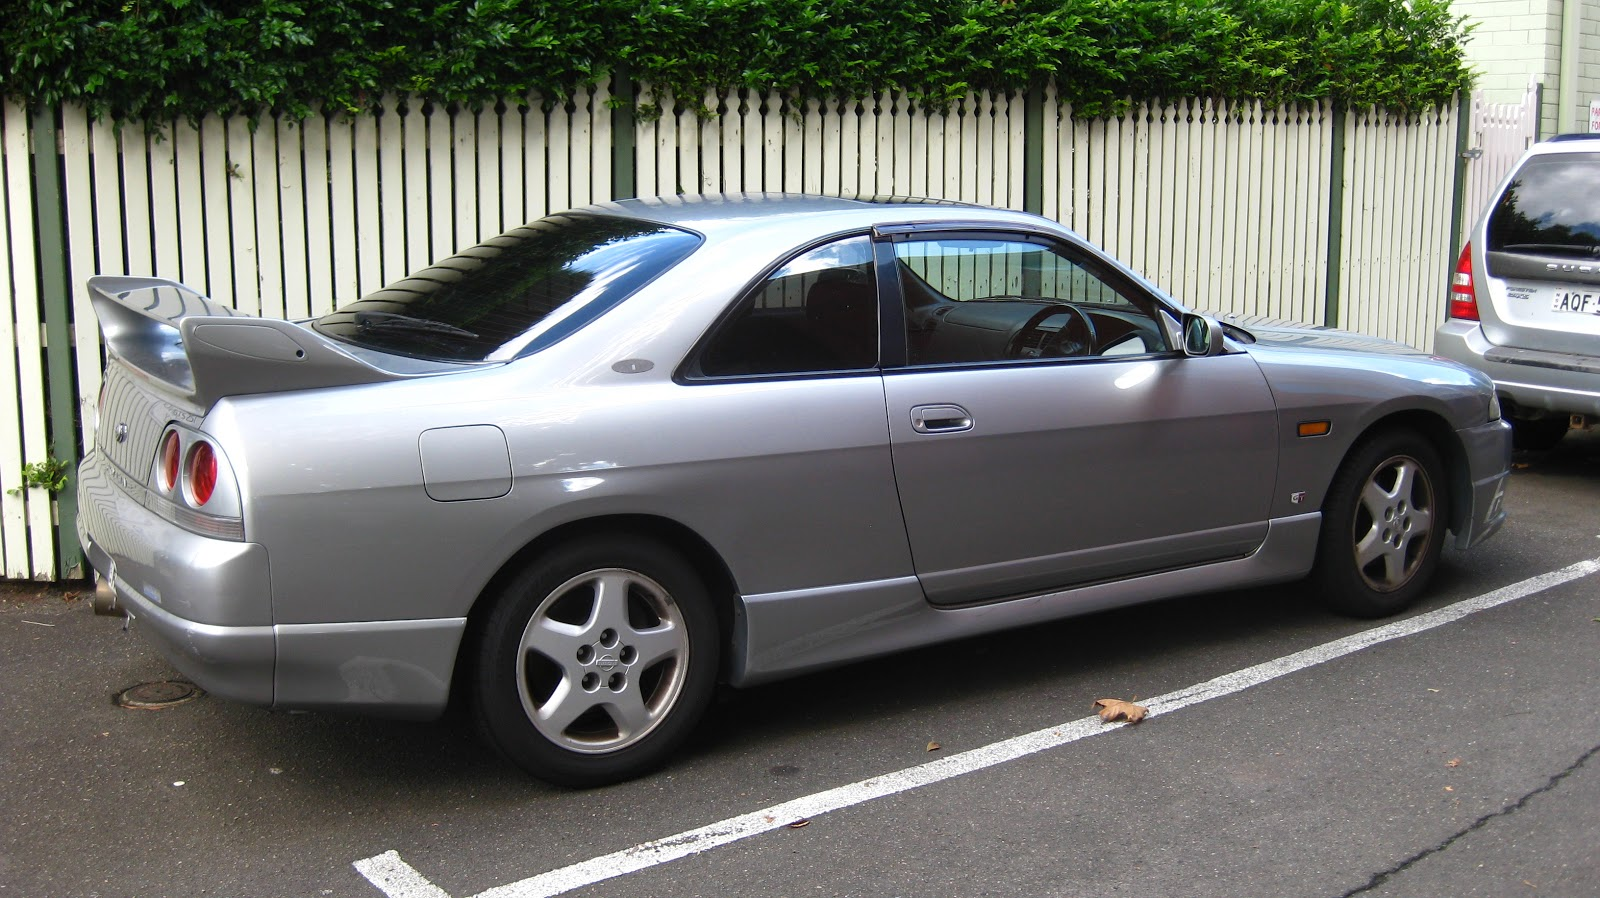 Aussie Old Parked Cars 1998 Nissan Skyline Gts 25t R33